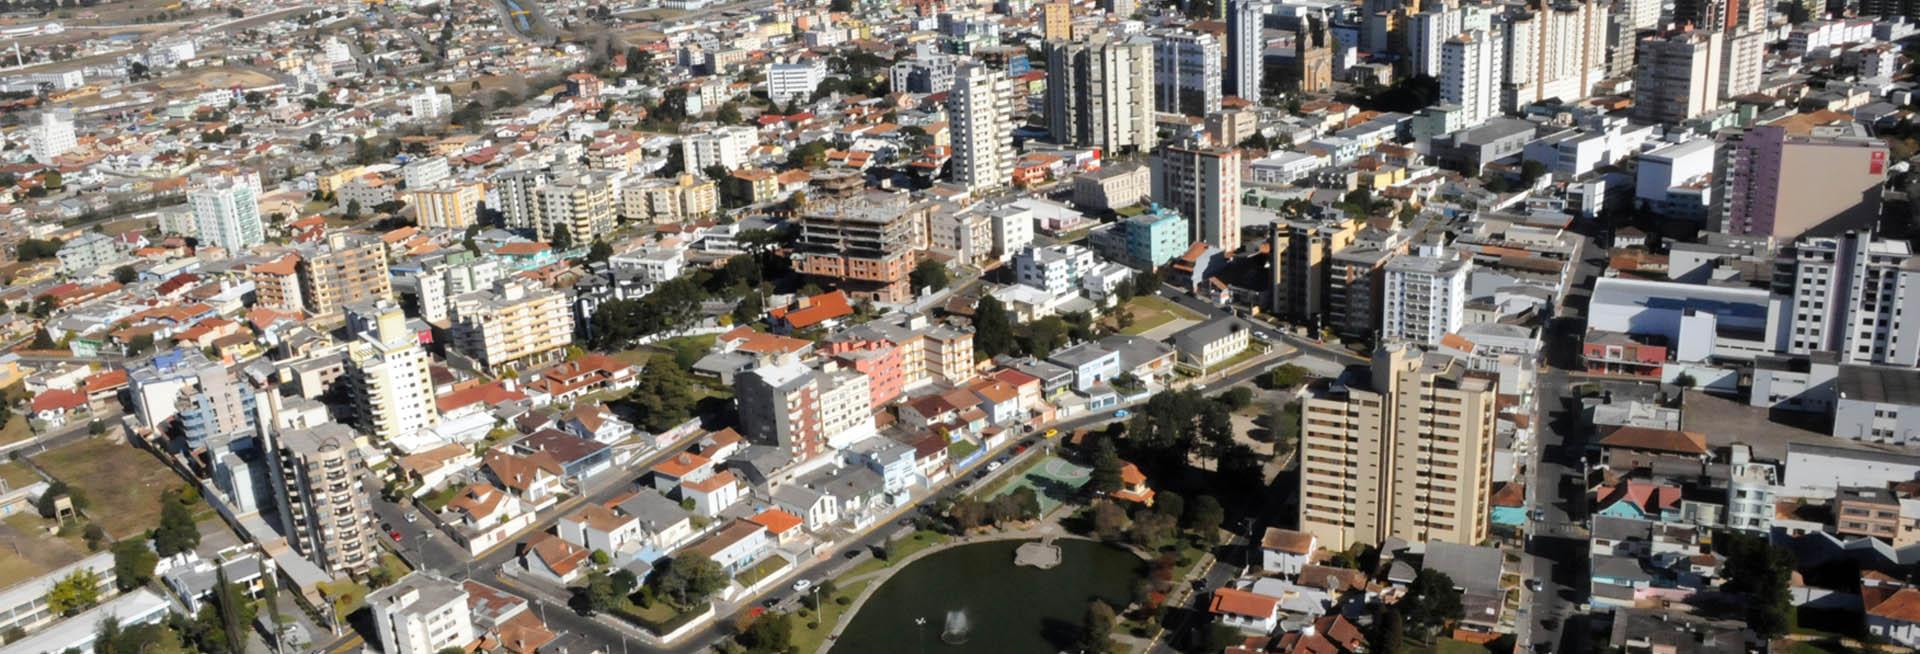 Lages, Santa Catarina